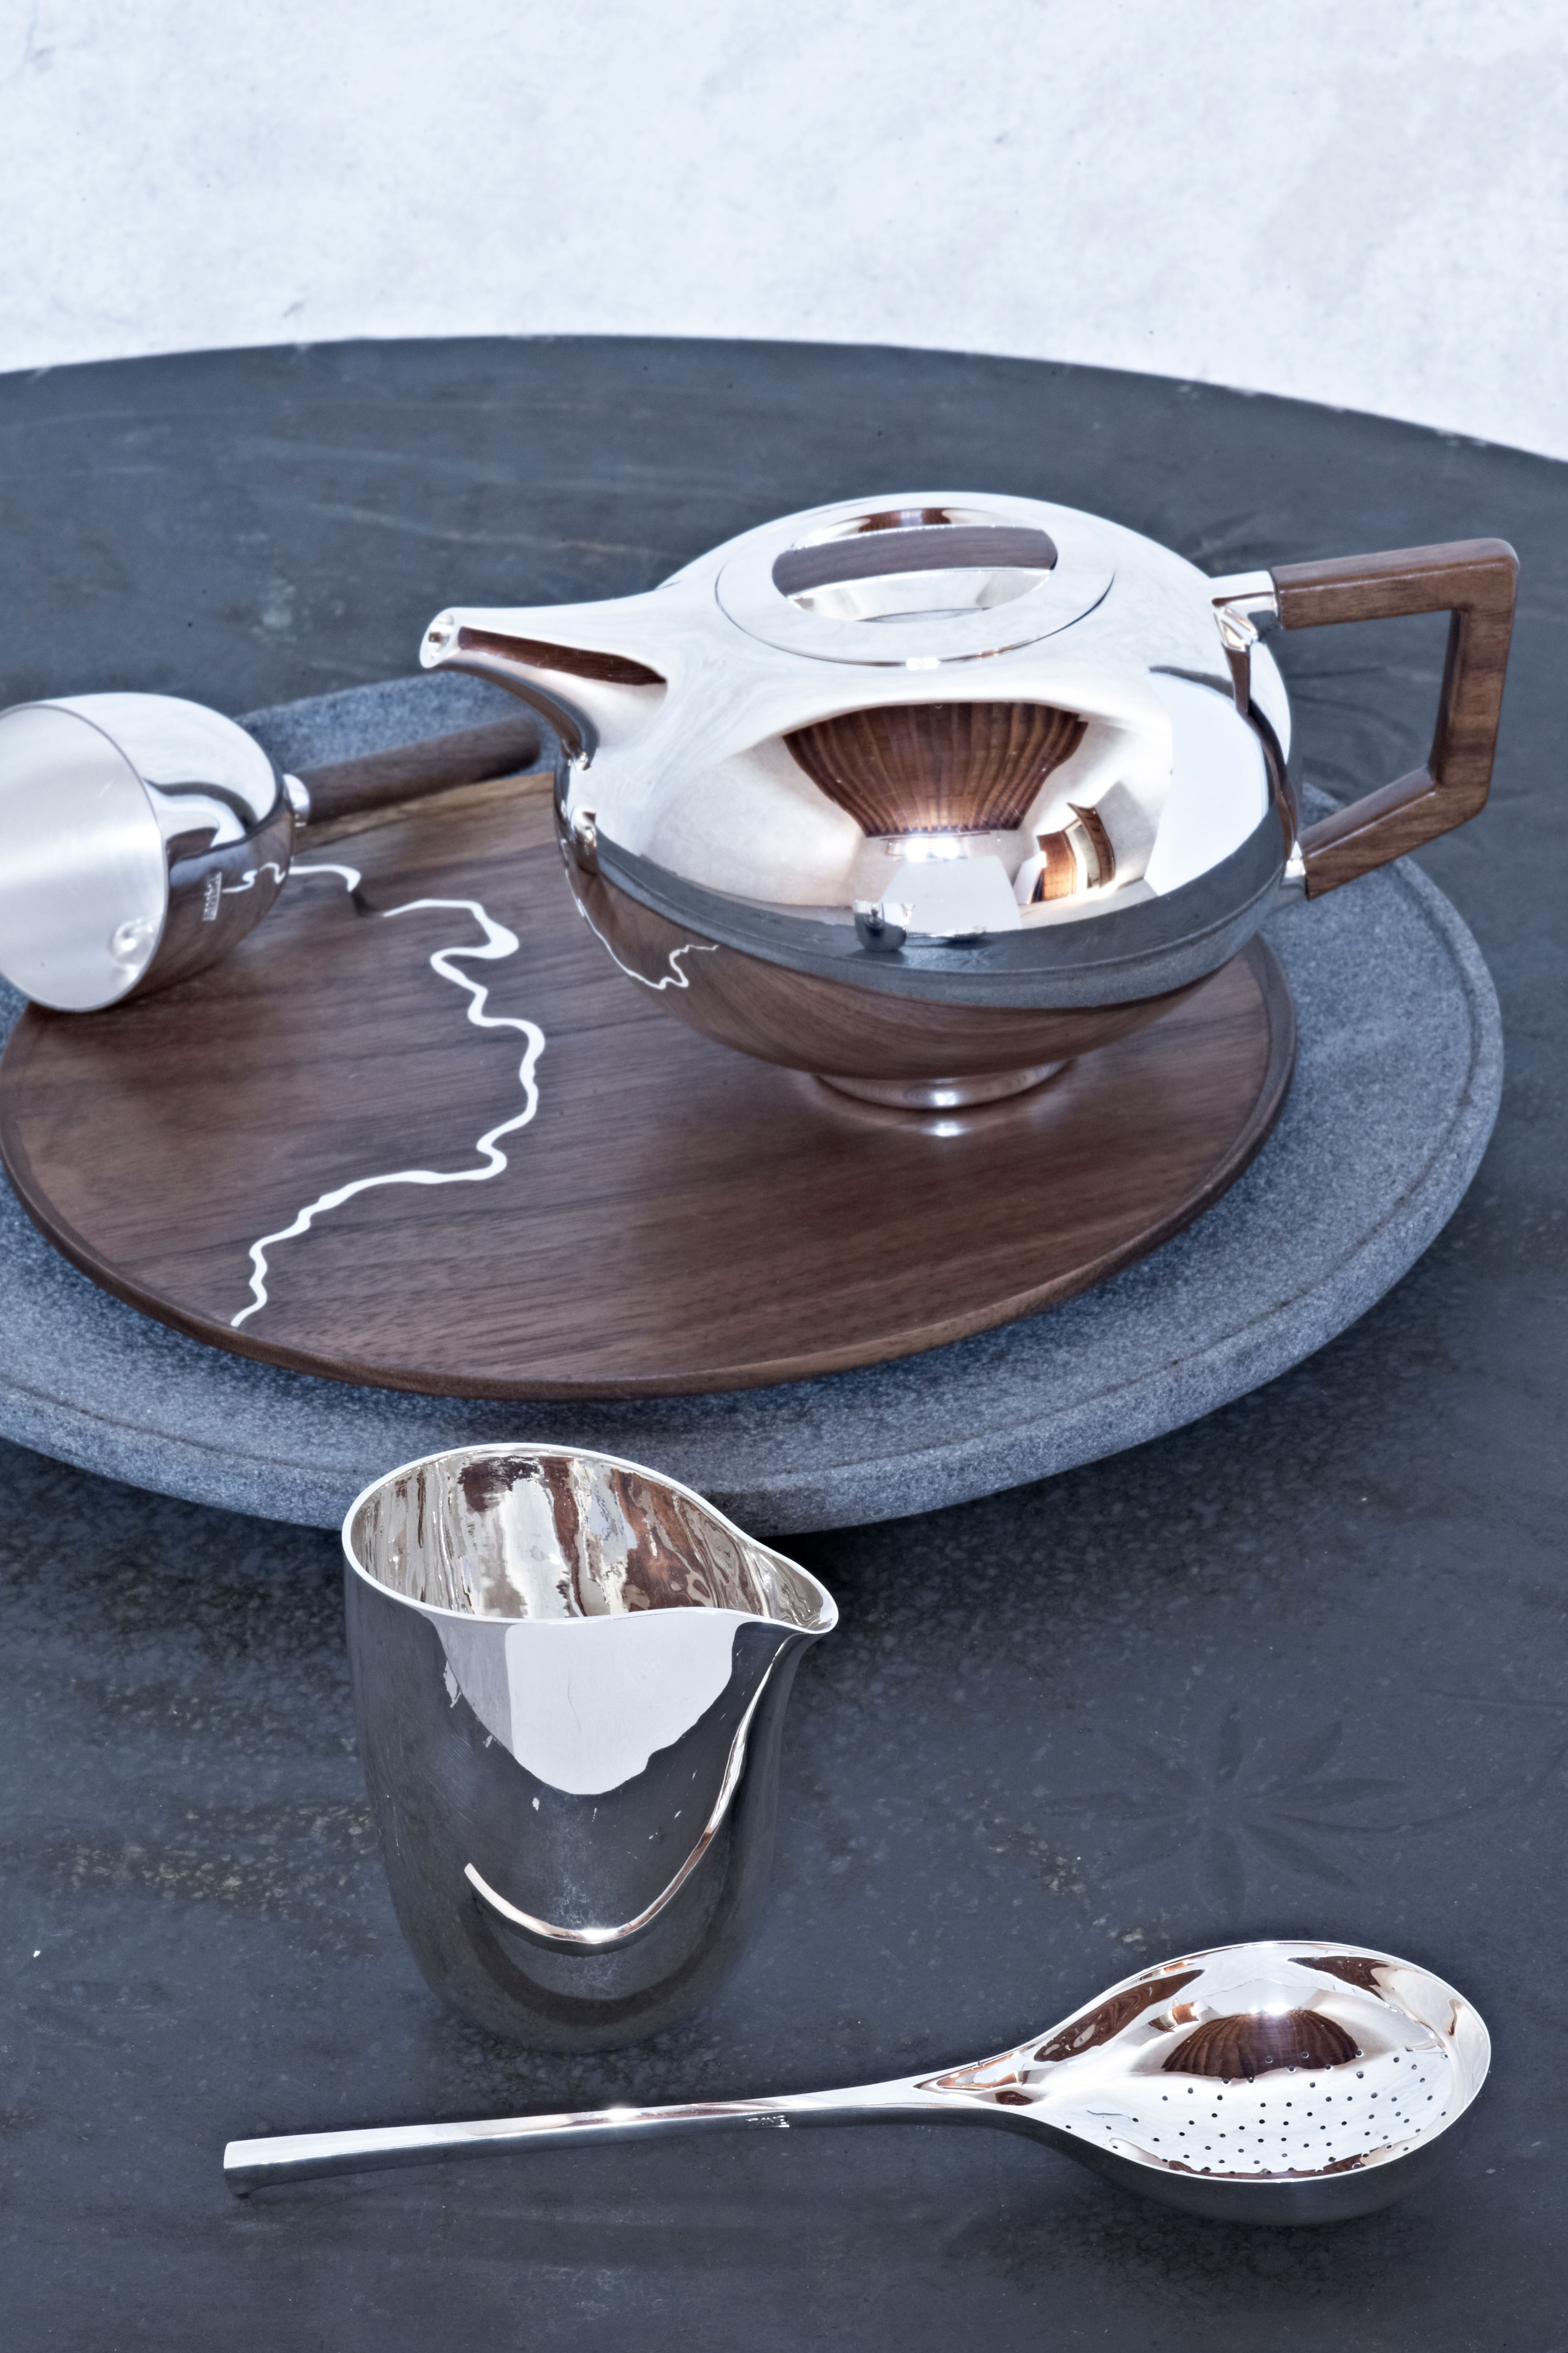 Tane Handcrafted Silver Teaware Teapot designed by Bodo Sperlein